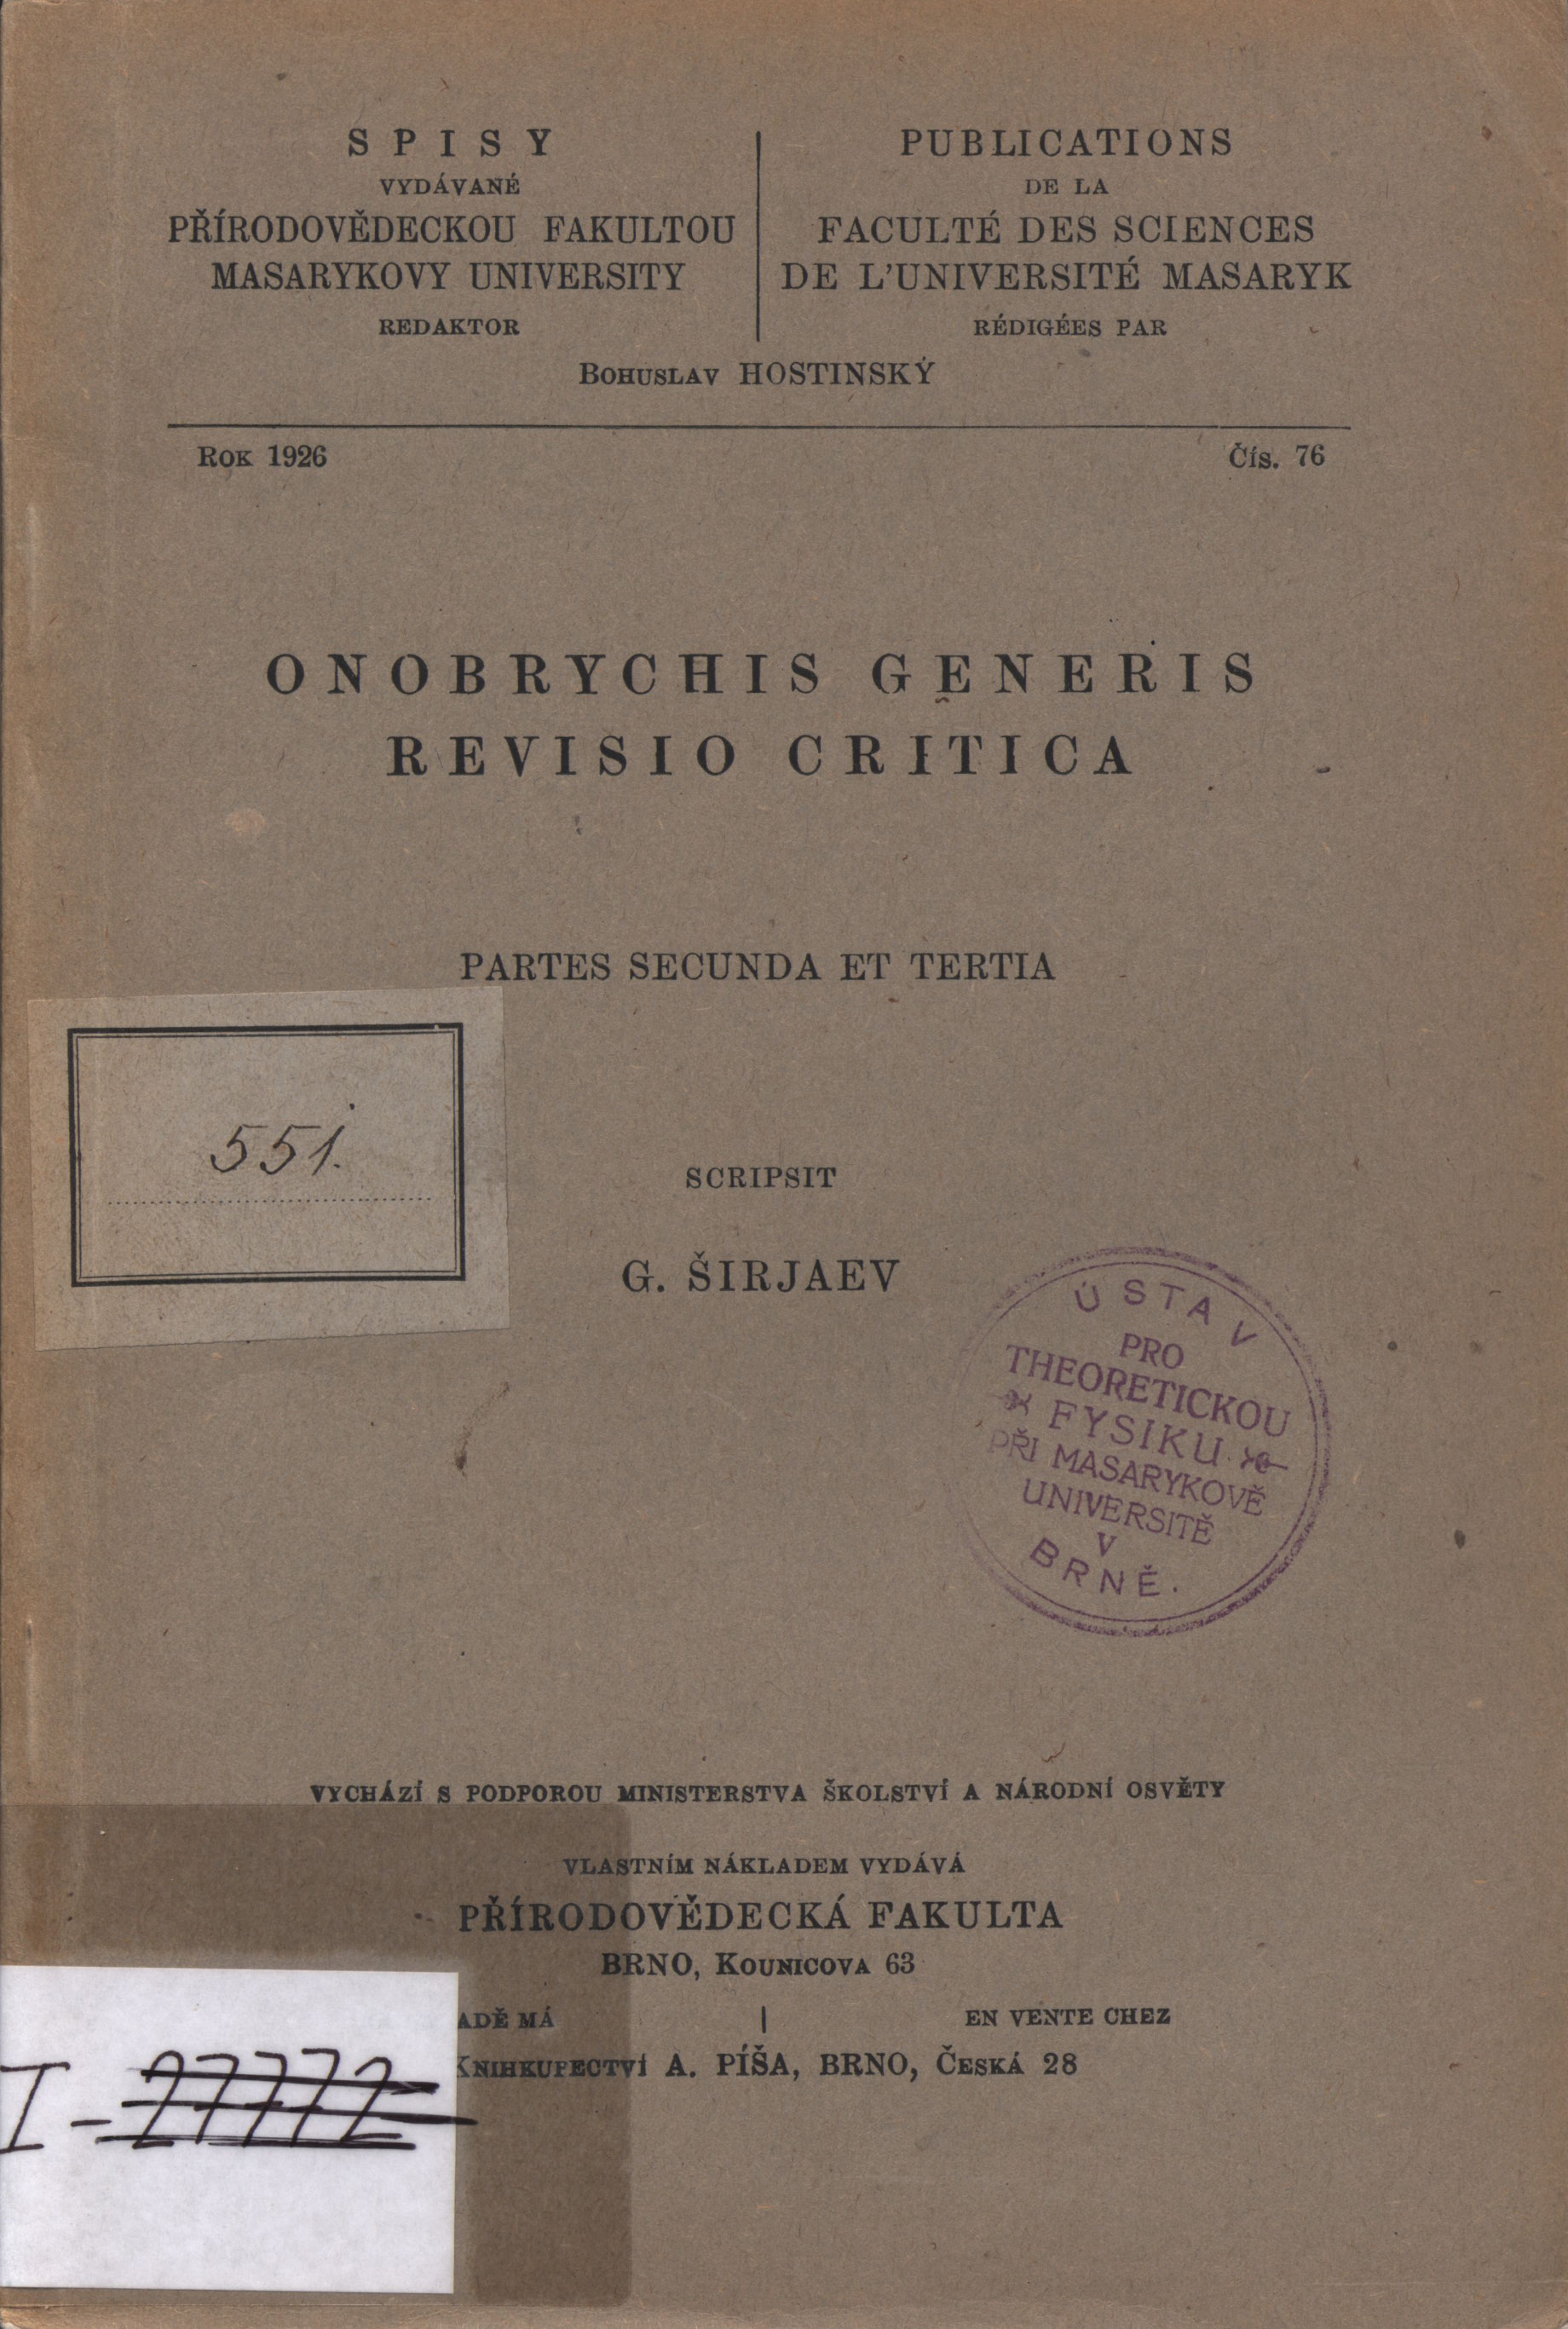 Obálka pro Onobrychis generis : Revisio critica. Partes secunda et tertia